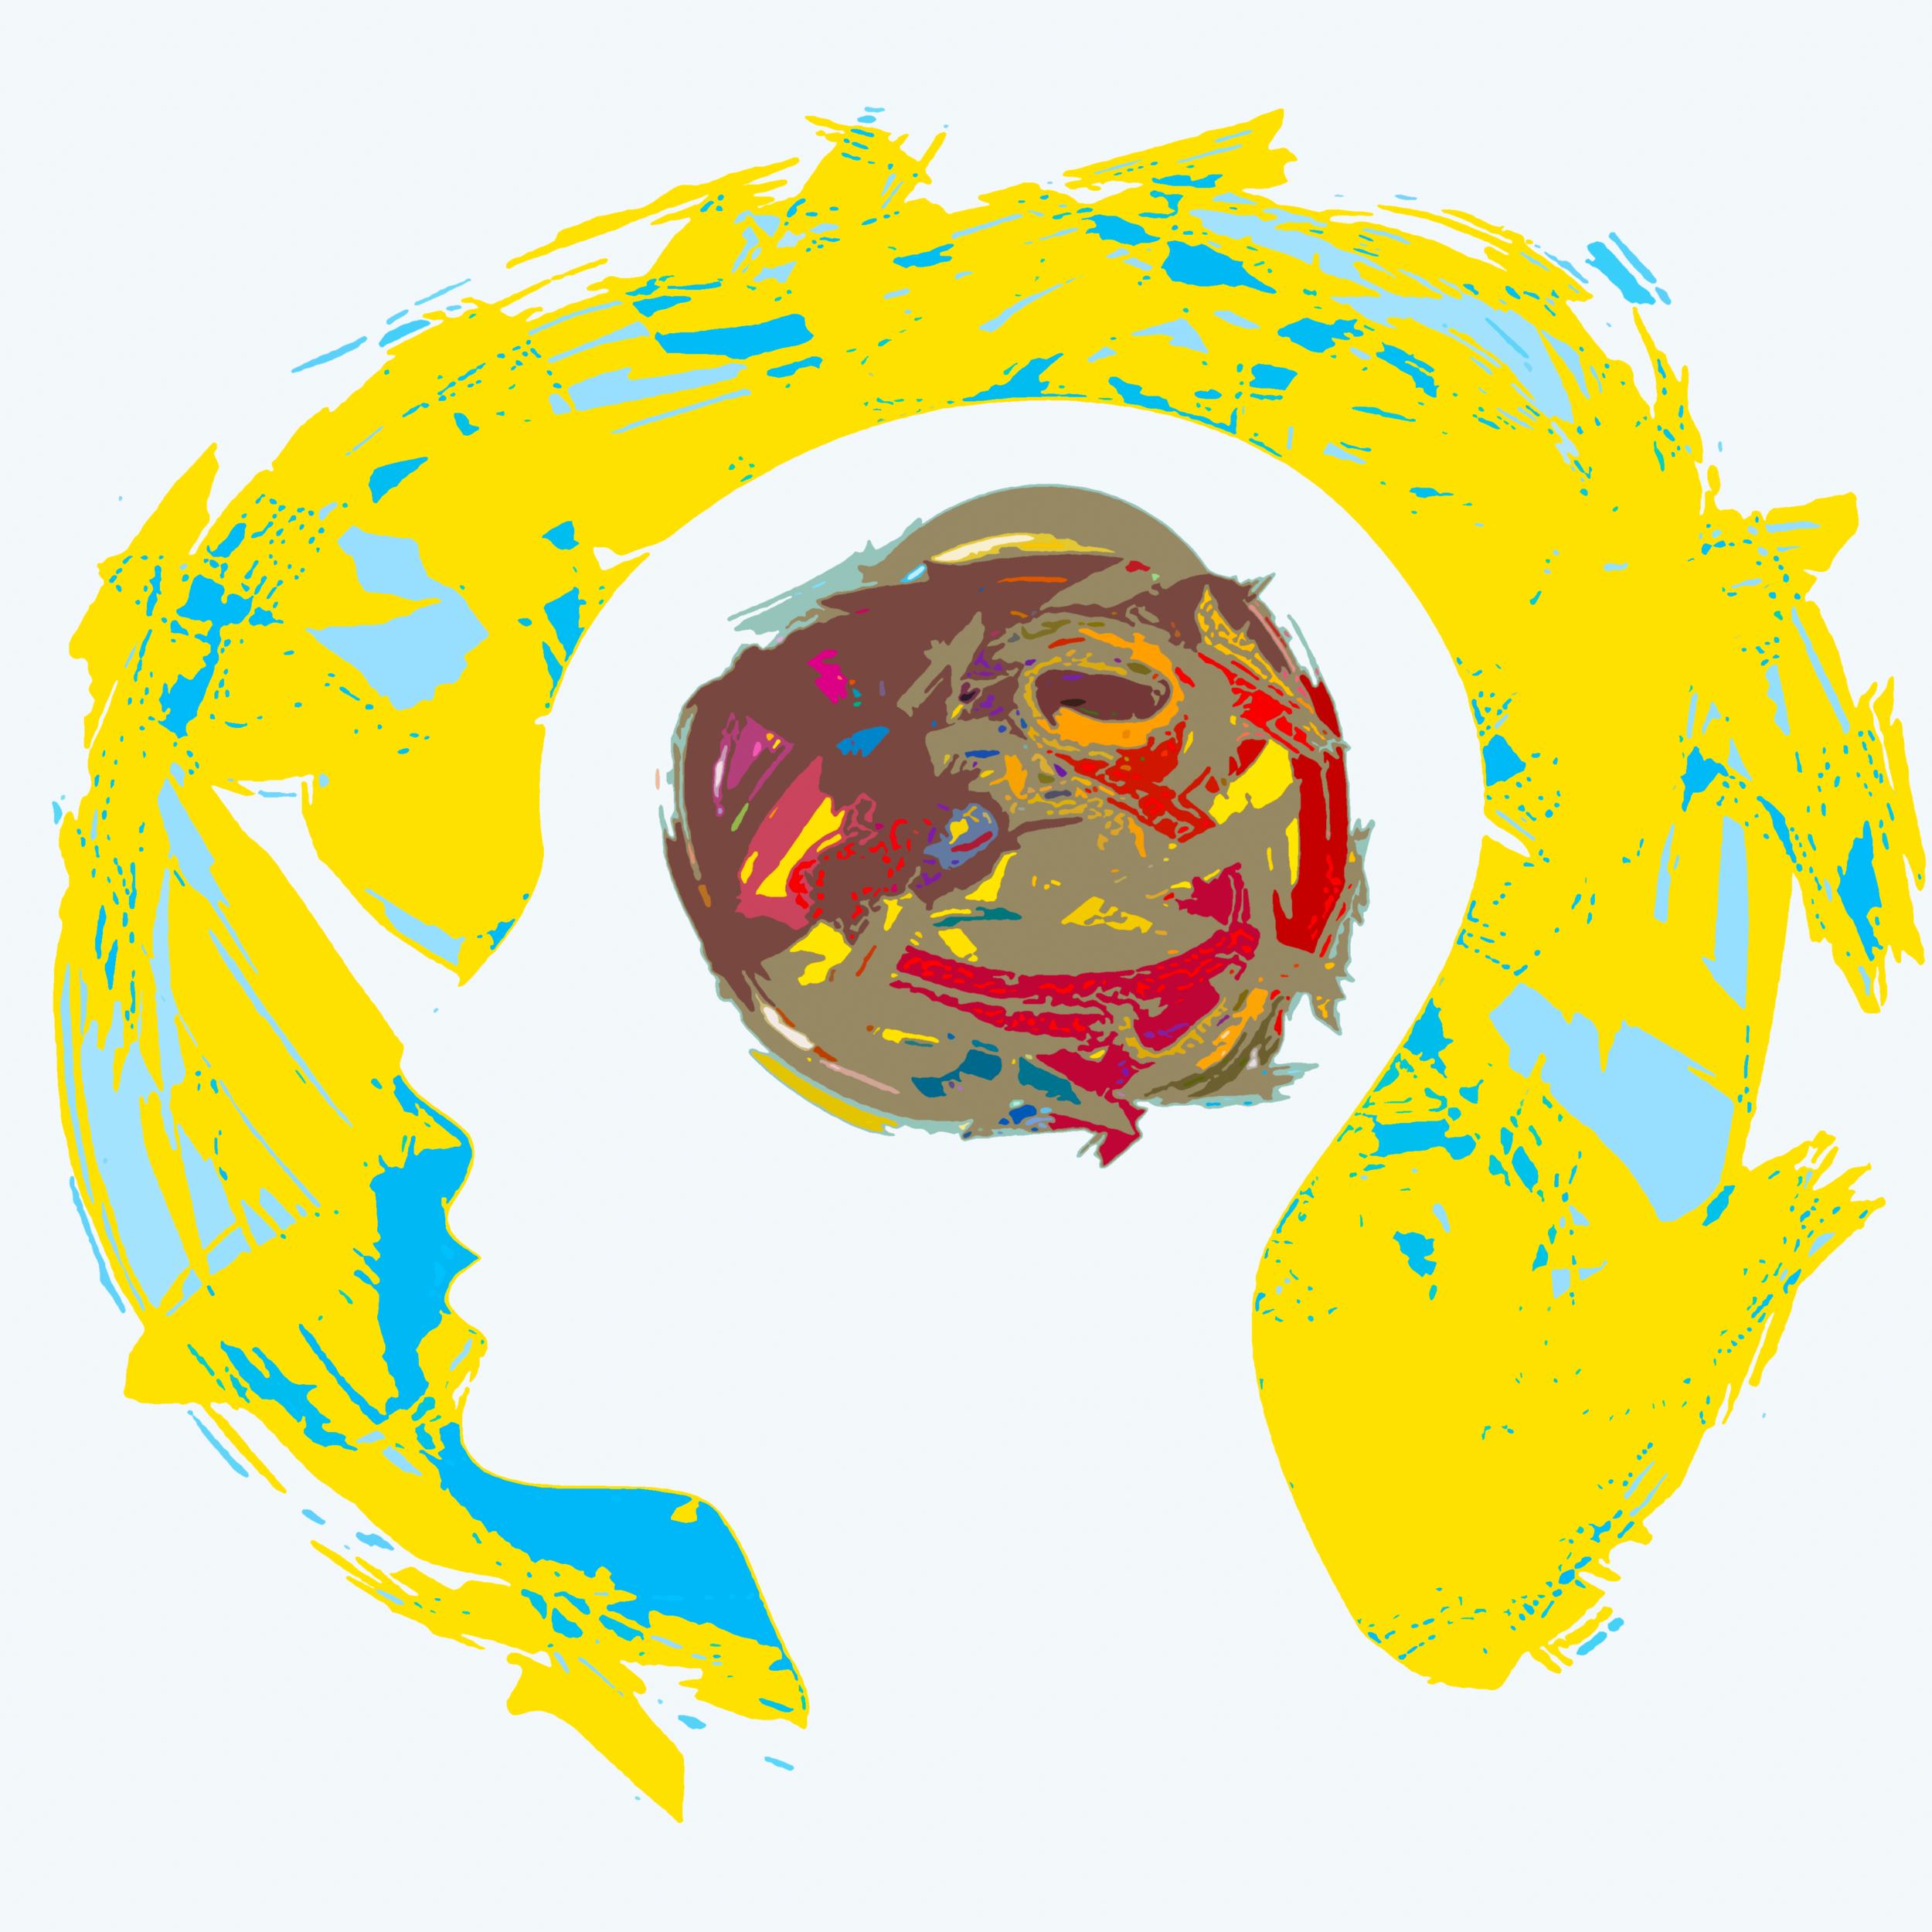 Mental Health and Mindfulness